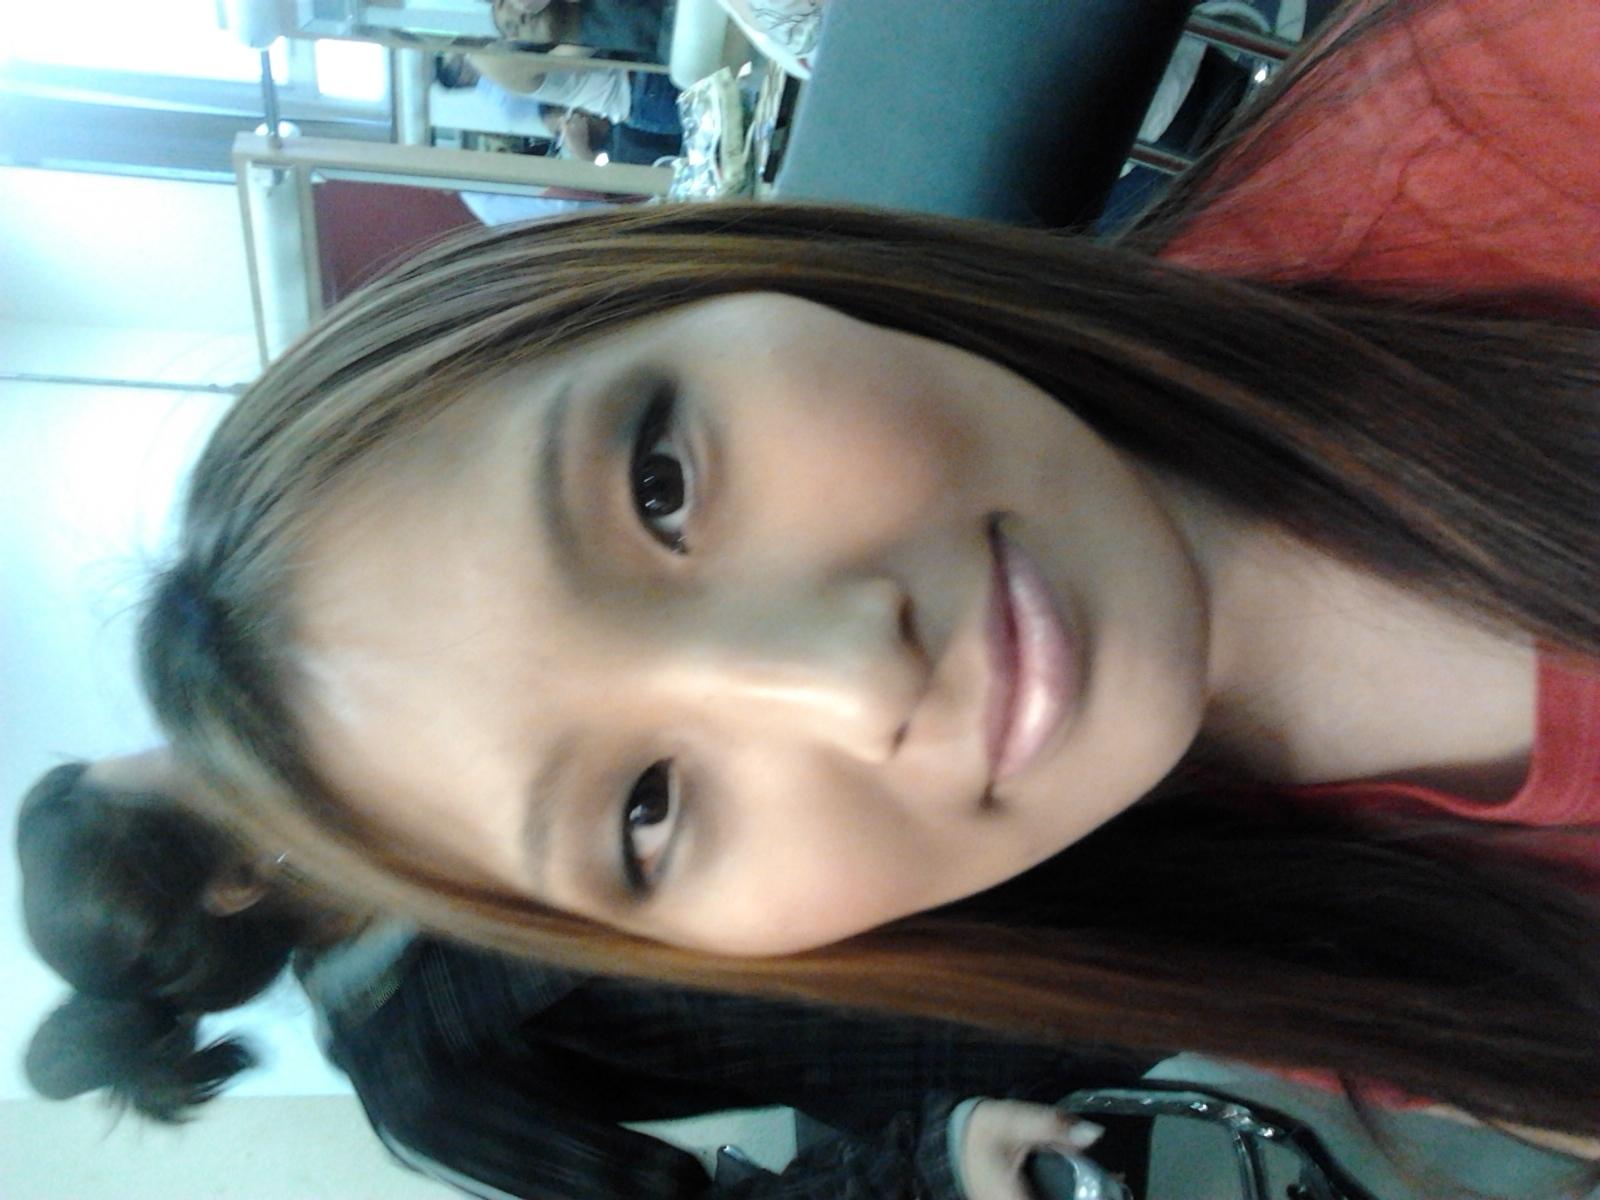 Maquiagem07 maquiador(a) consultor(a) de estetica